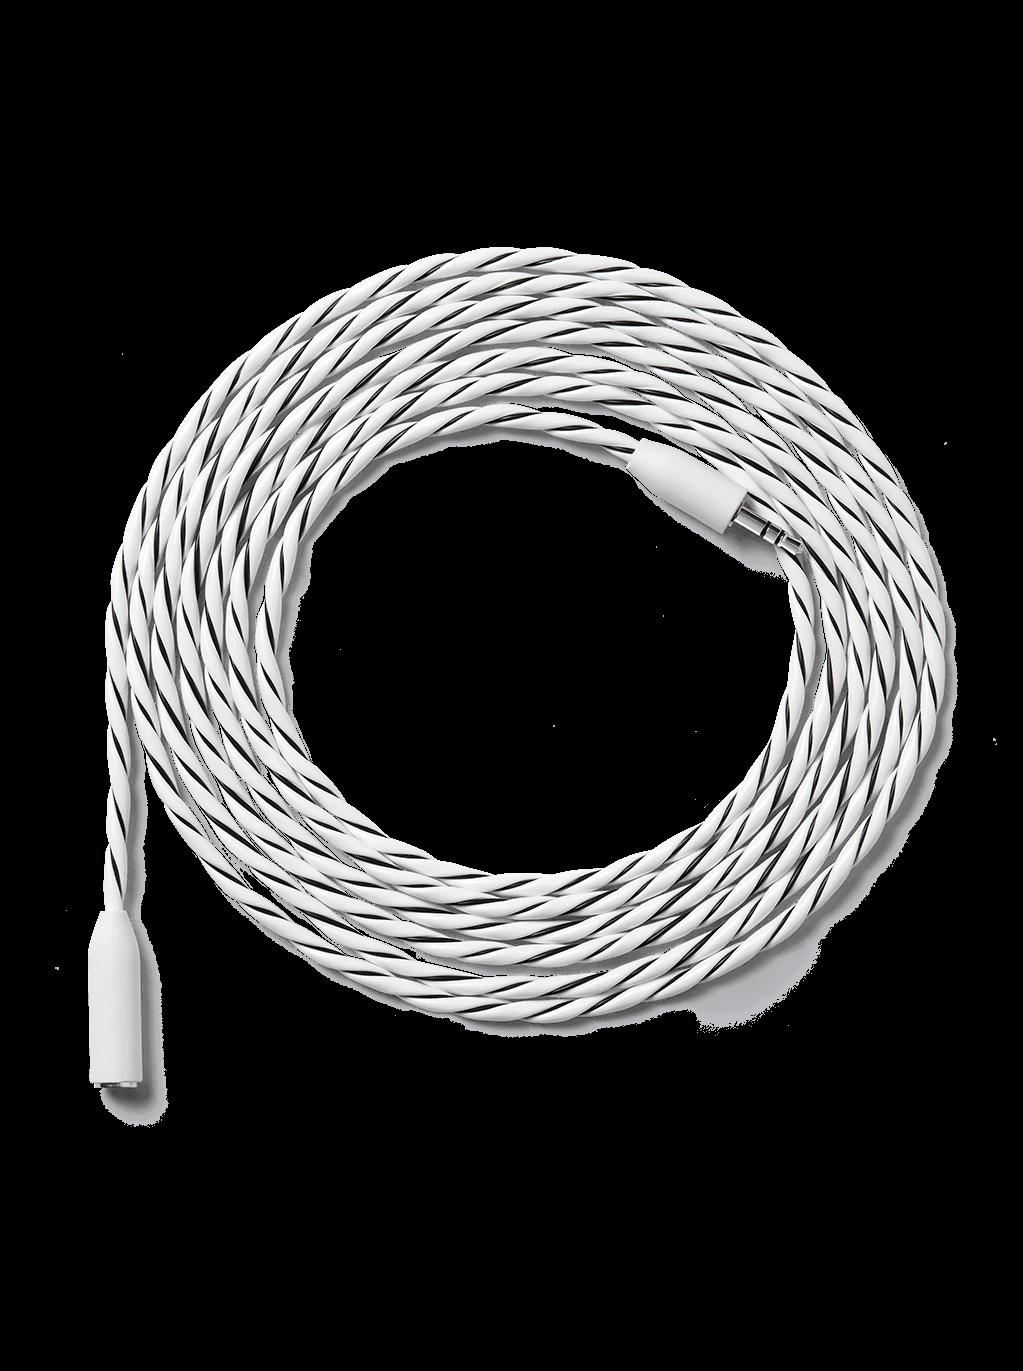 Cisco Meraki - Water leak detection cable